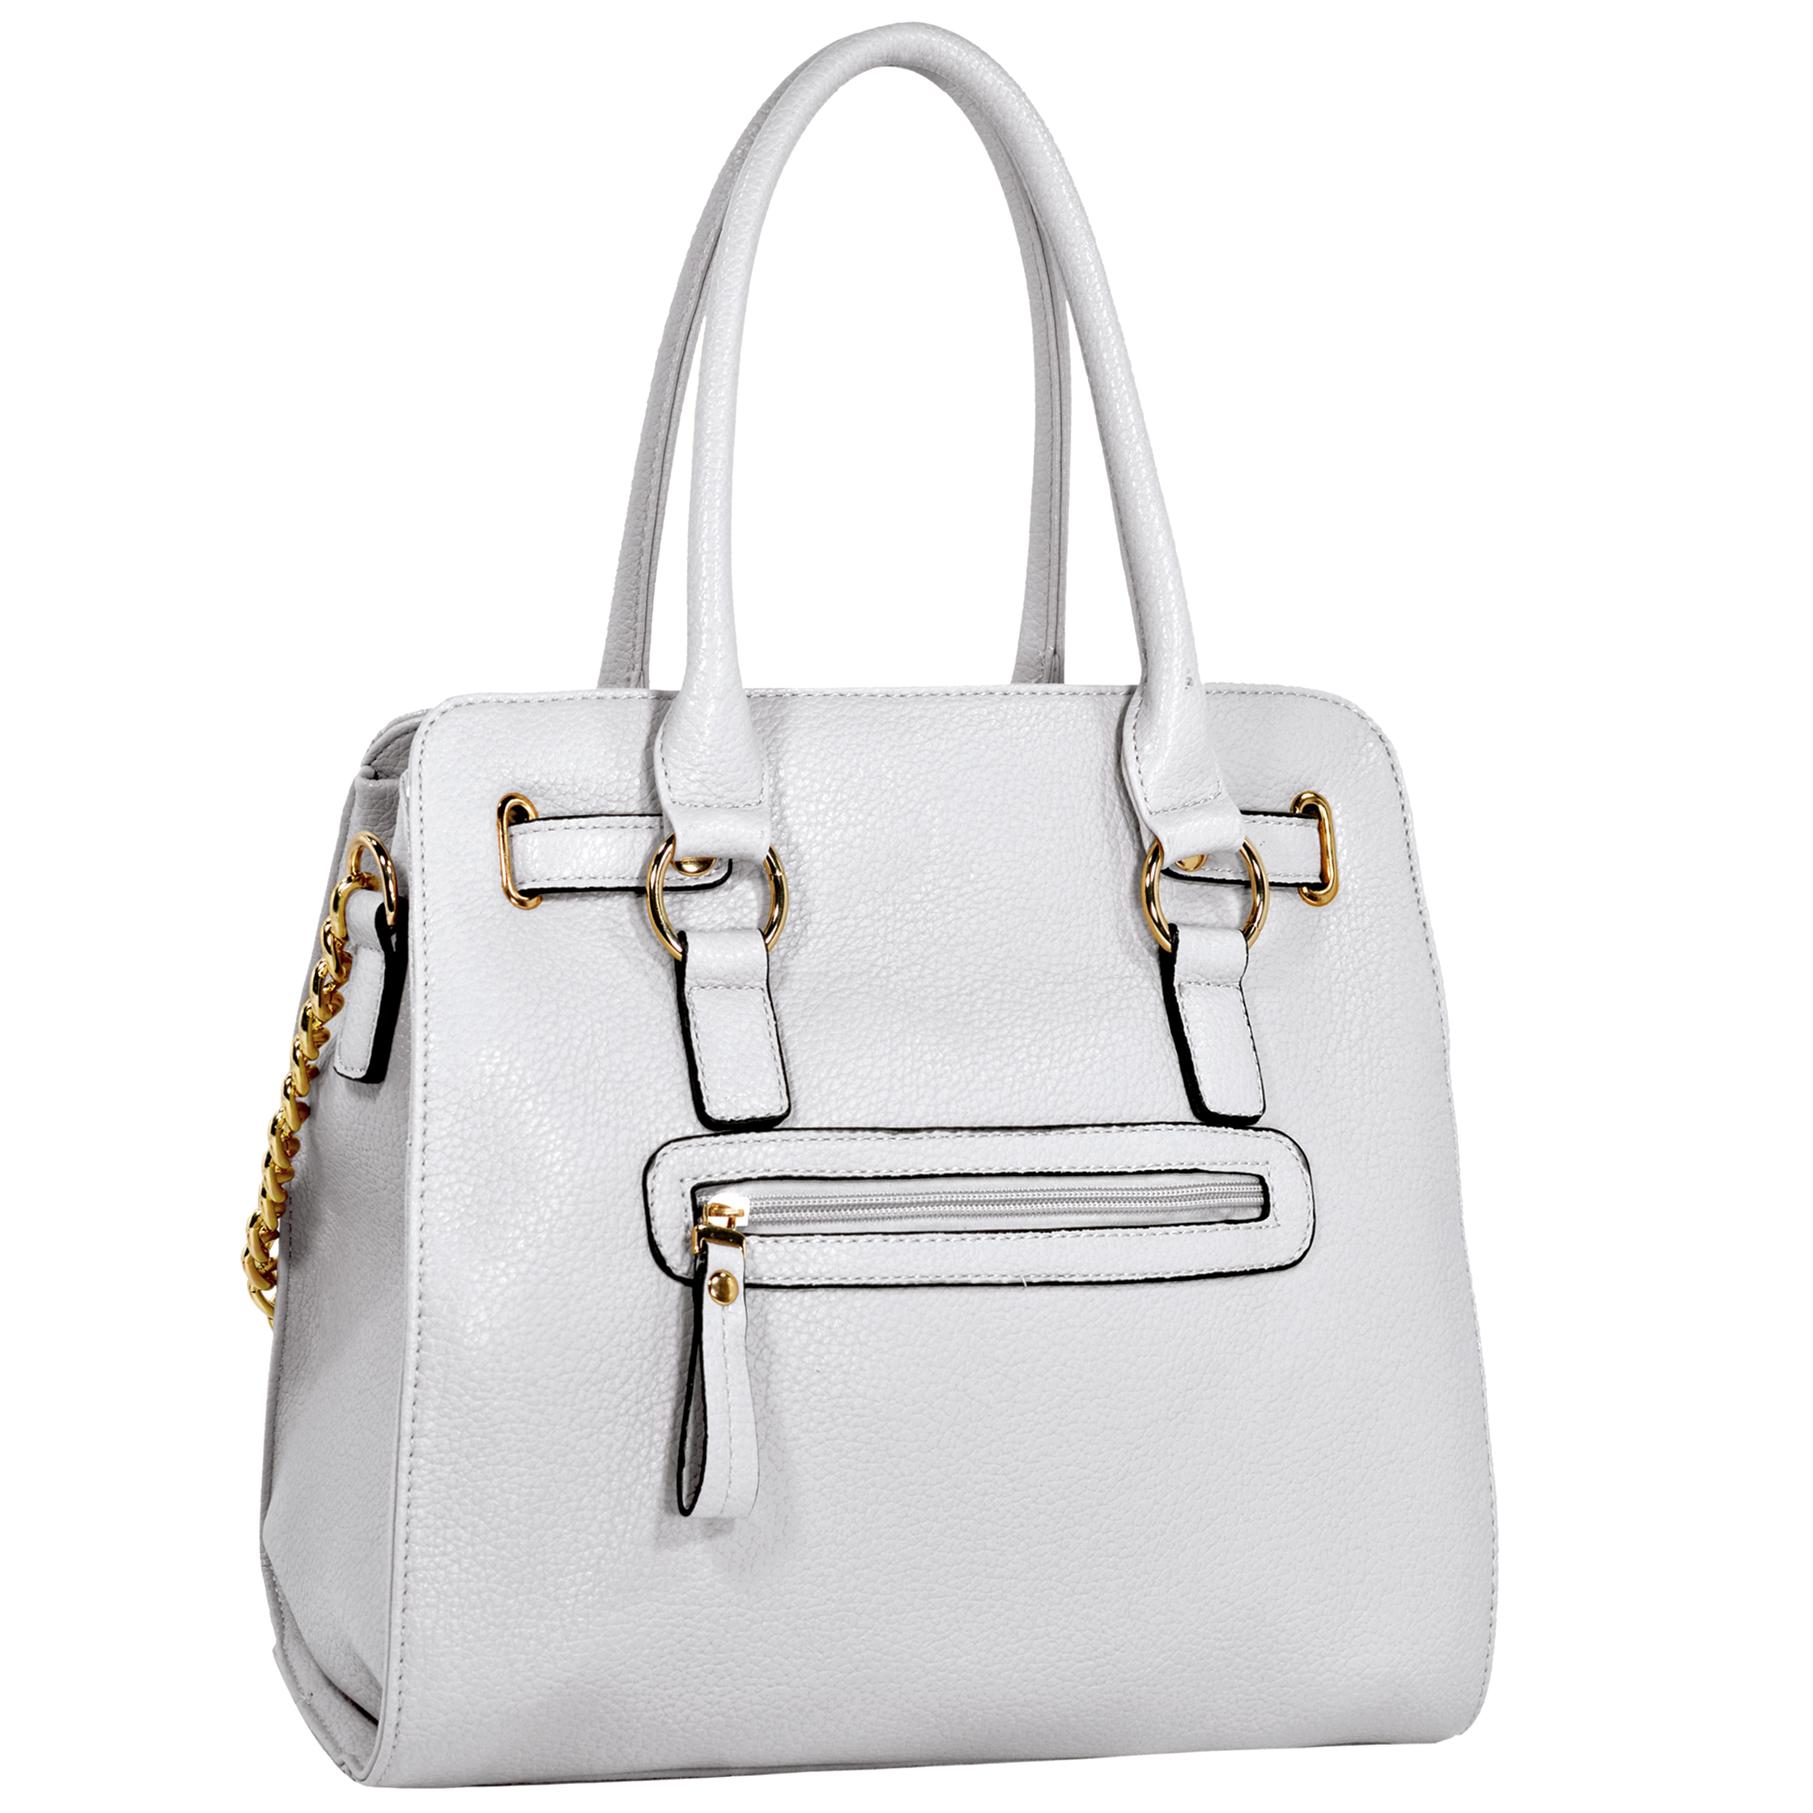 HALEY White Bowler Style Handbag Back